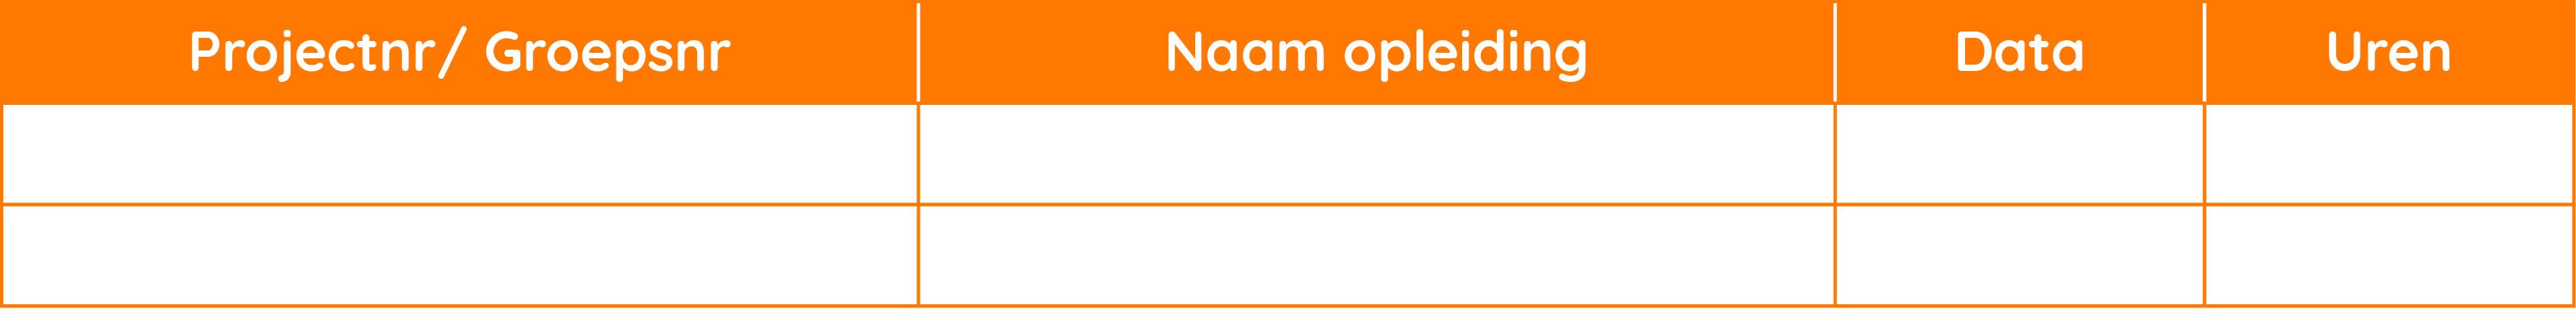 Projectnr - Groepsnr - Naam opleiding - Data - Uren